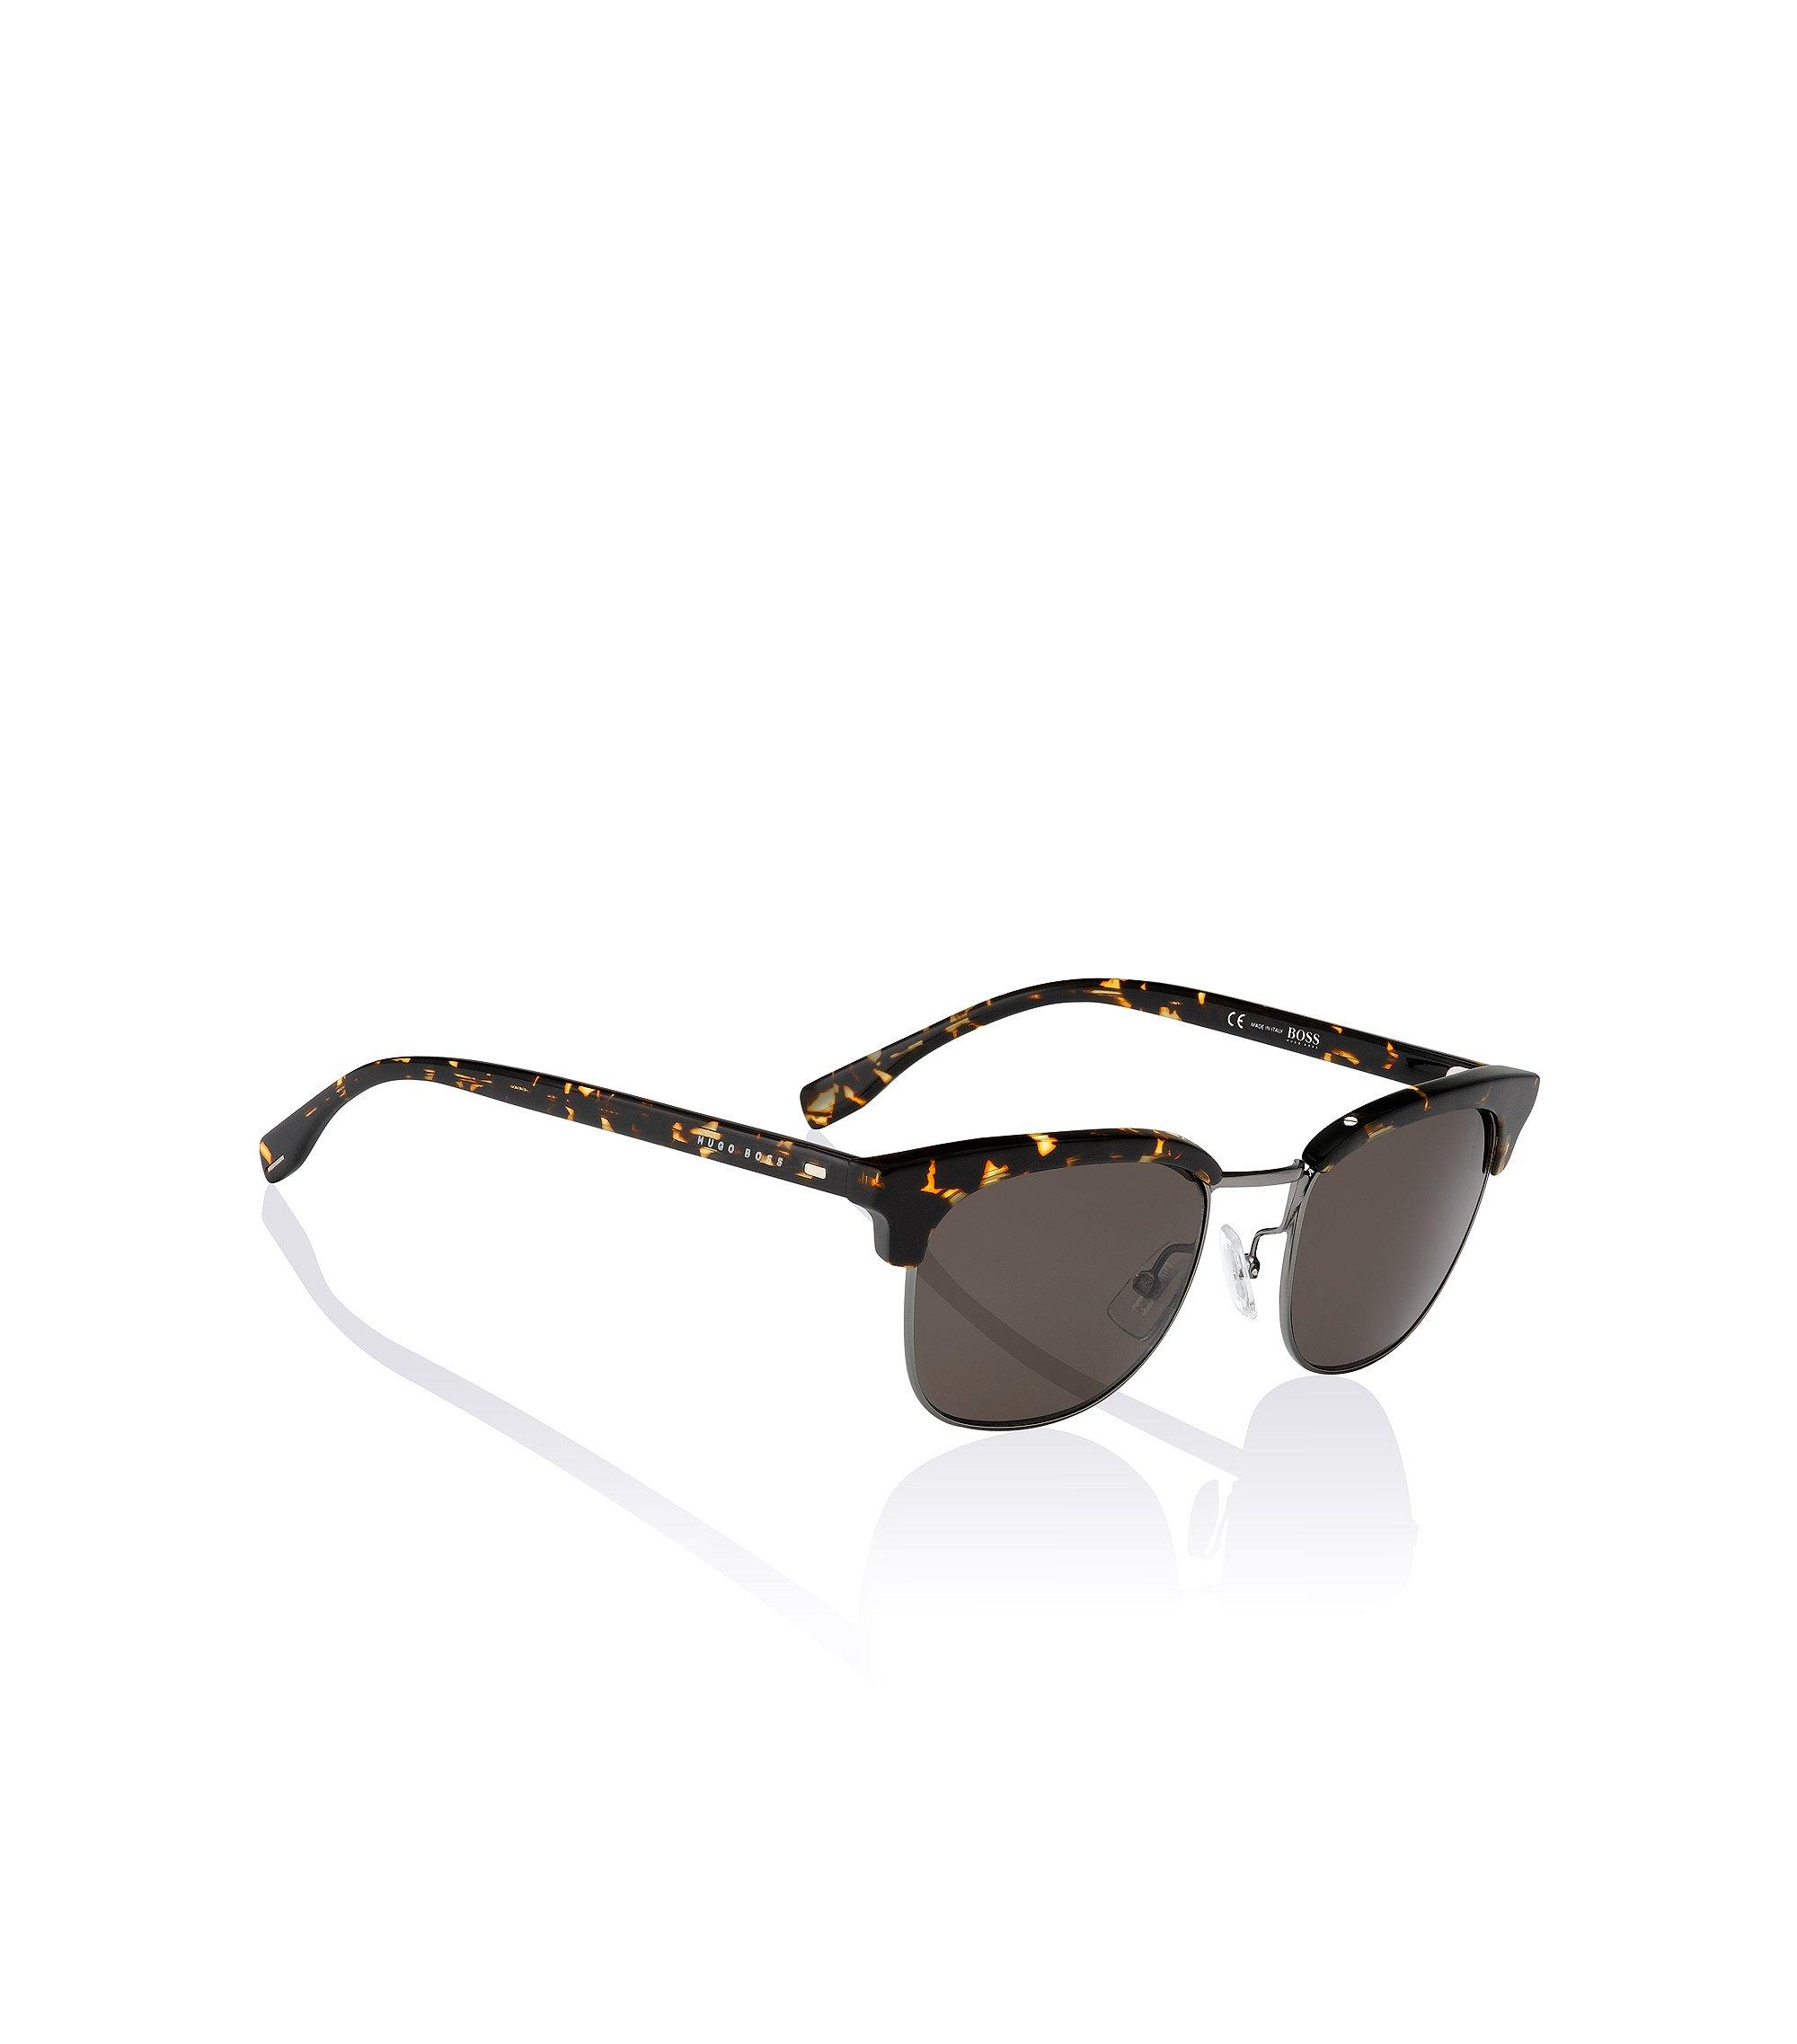 Clubmaster-zonnebril 'BOSS 0667' van kunststof en metaal, Assorted-Pre-Pack